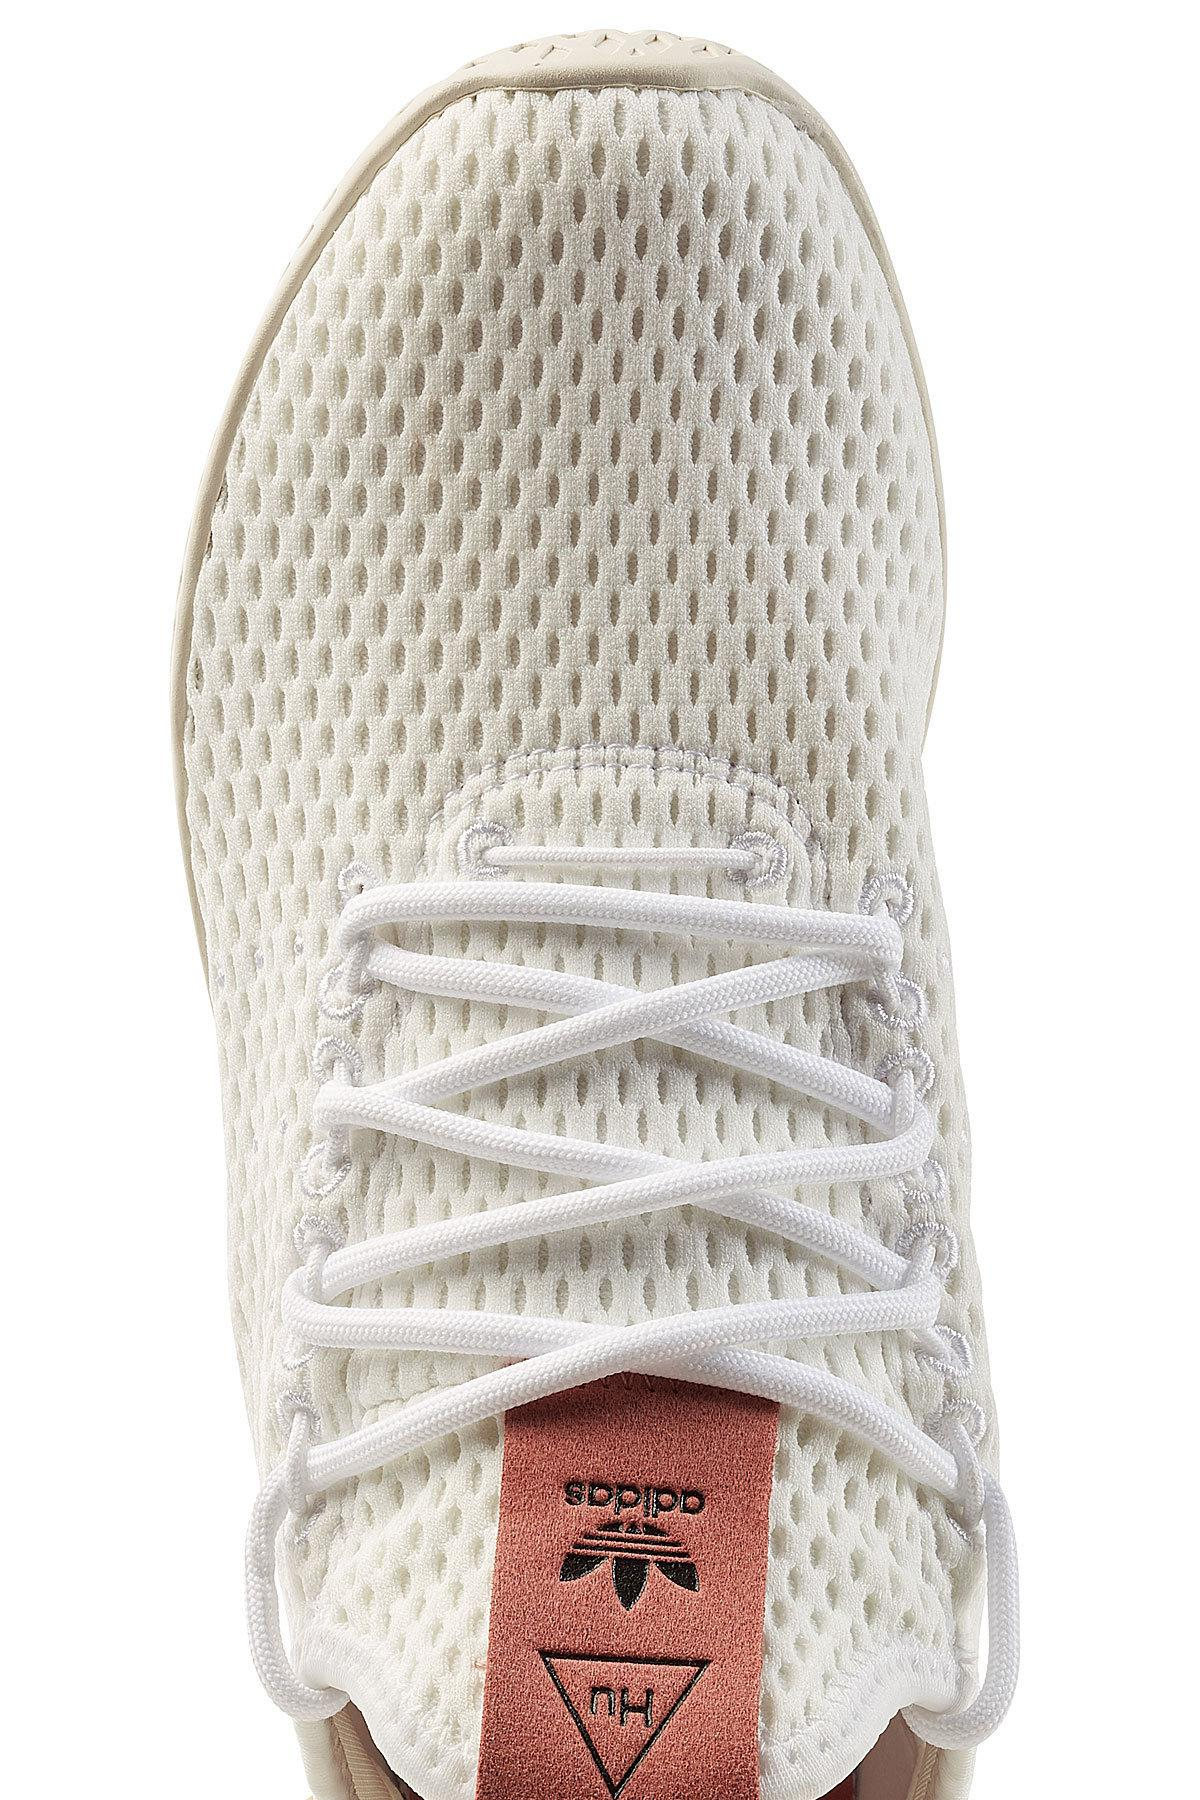 Adidas Originals Adidas Originals Pharrell Williams Tennis HU Sneakers from STYLEBOP (US) | Real Simple